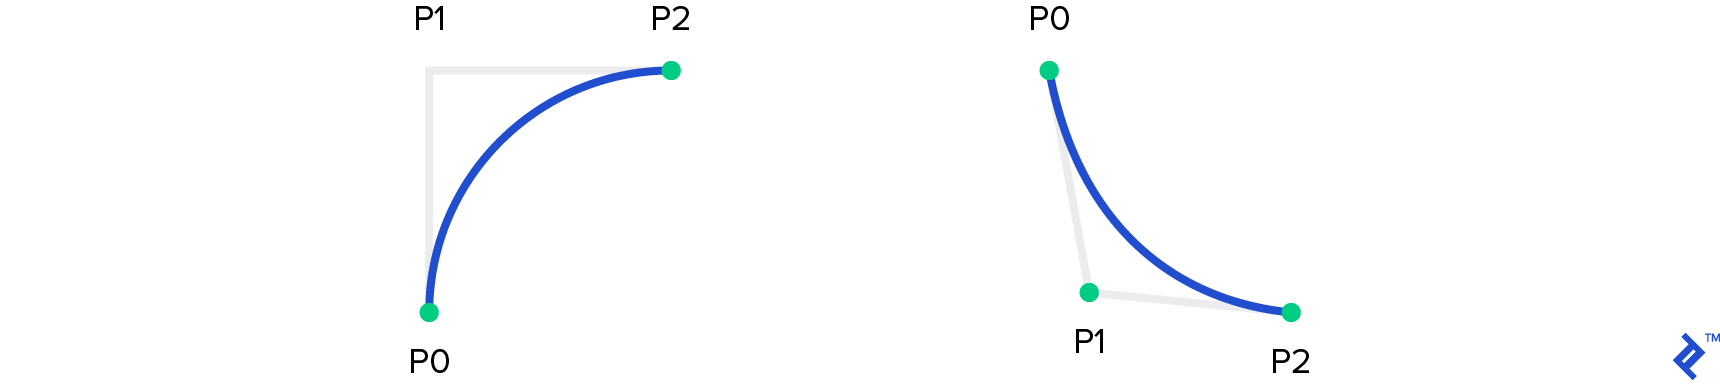 Quadratic Bezier curves